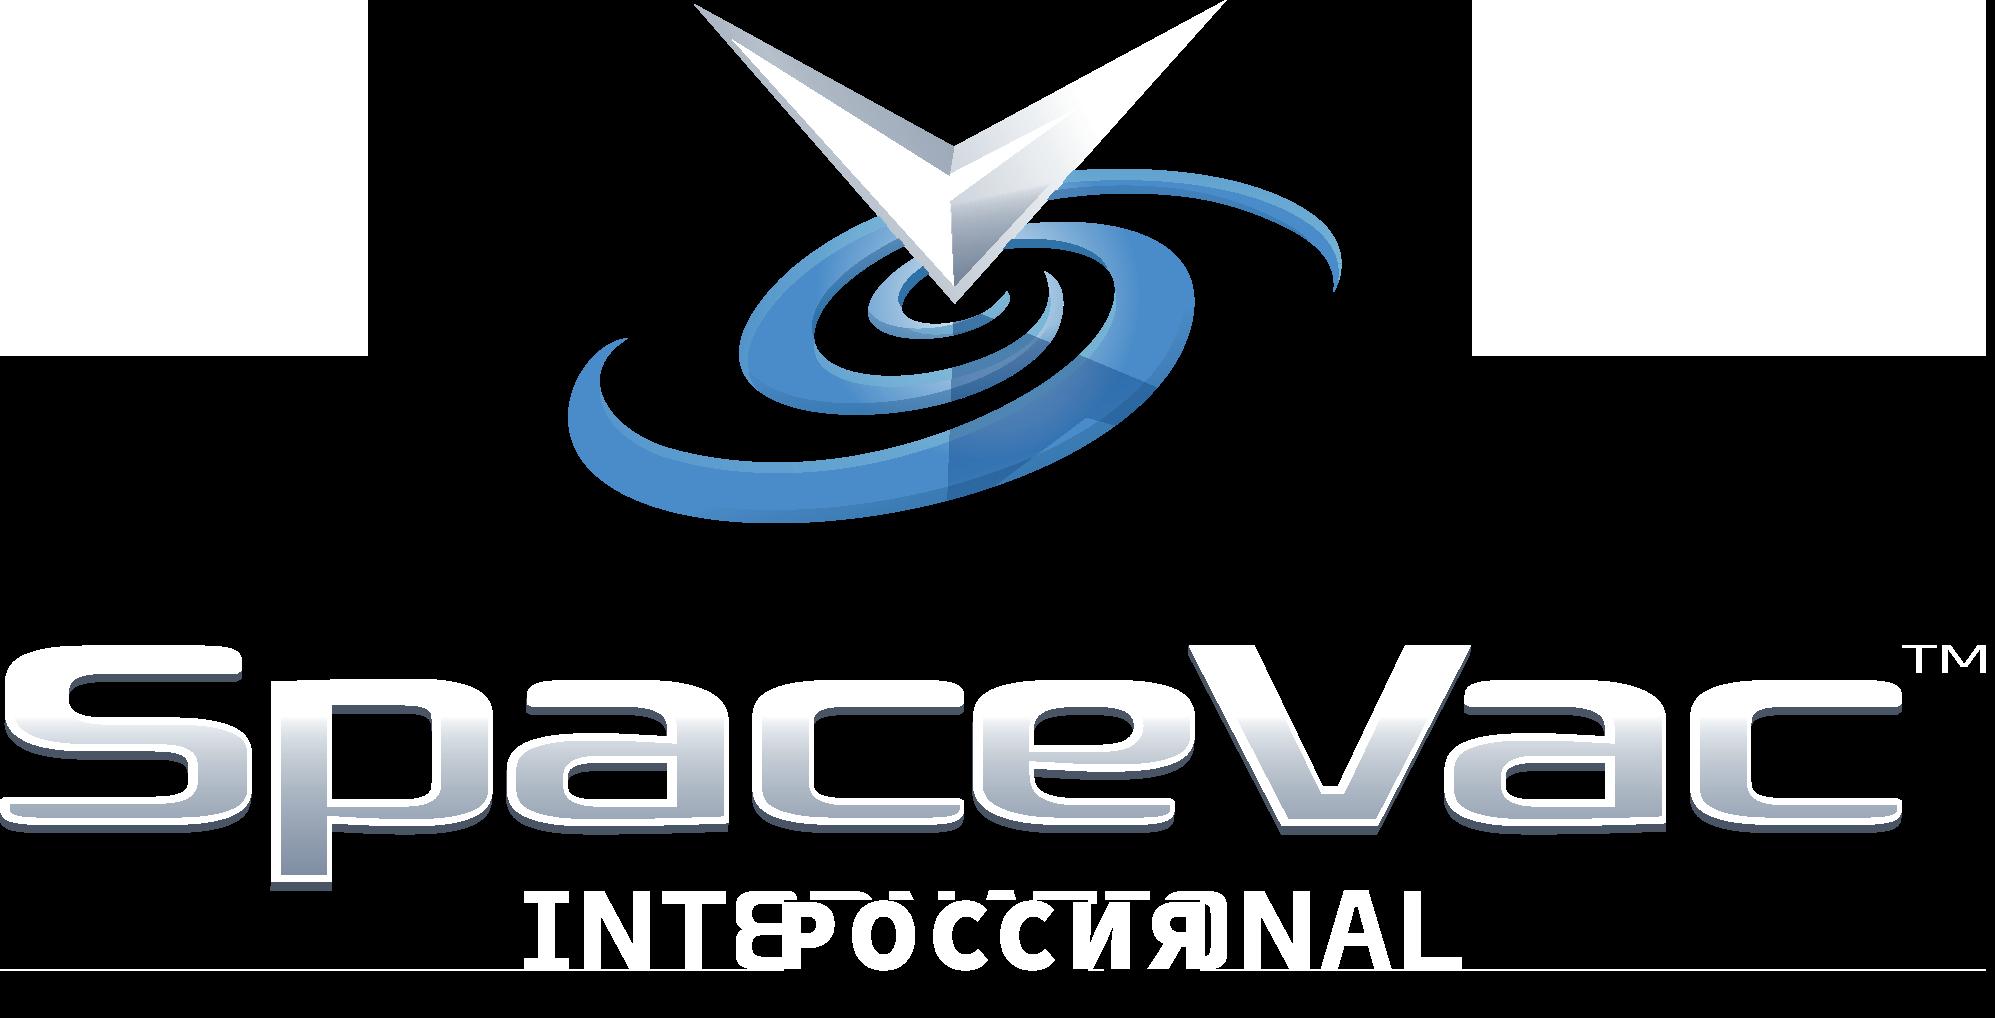 Spacevac Россия